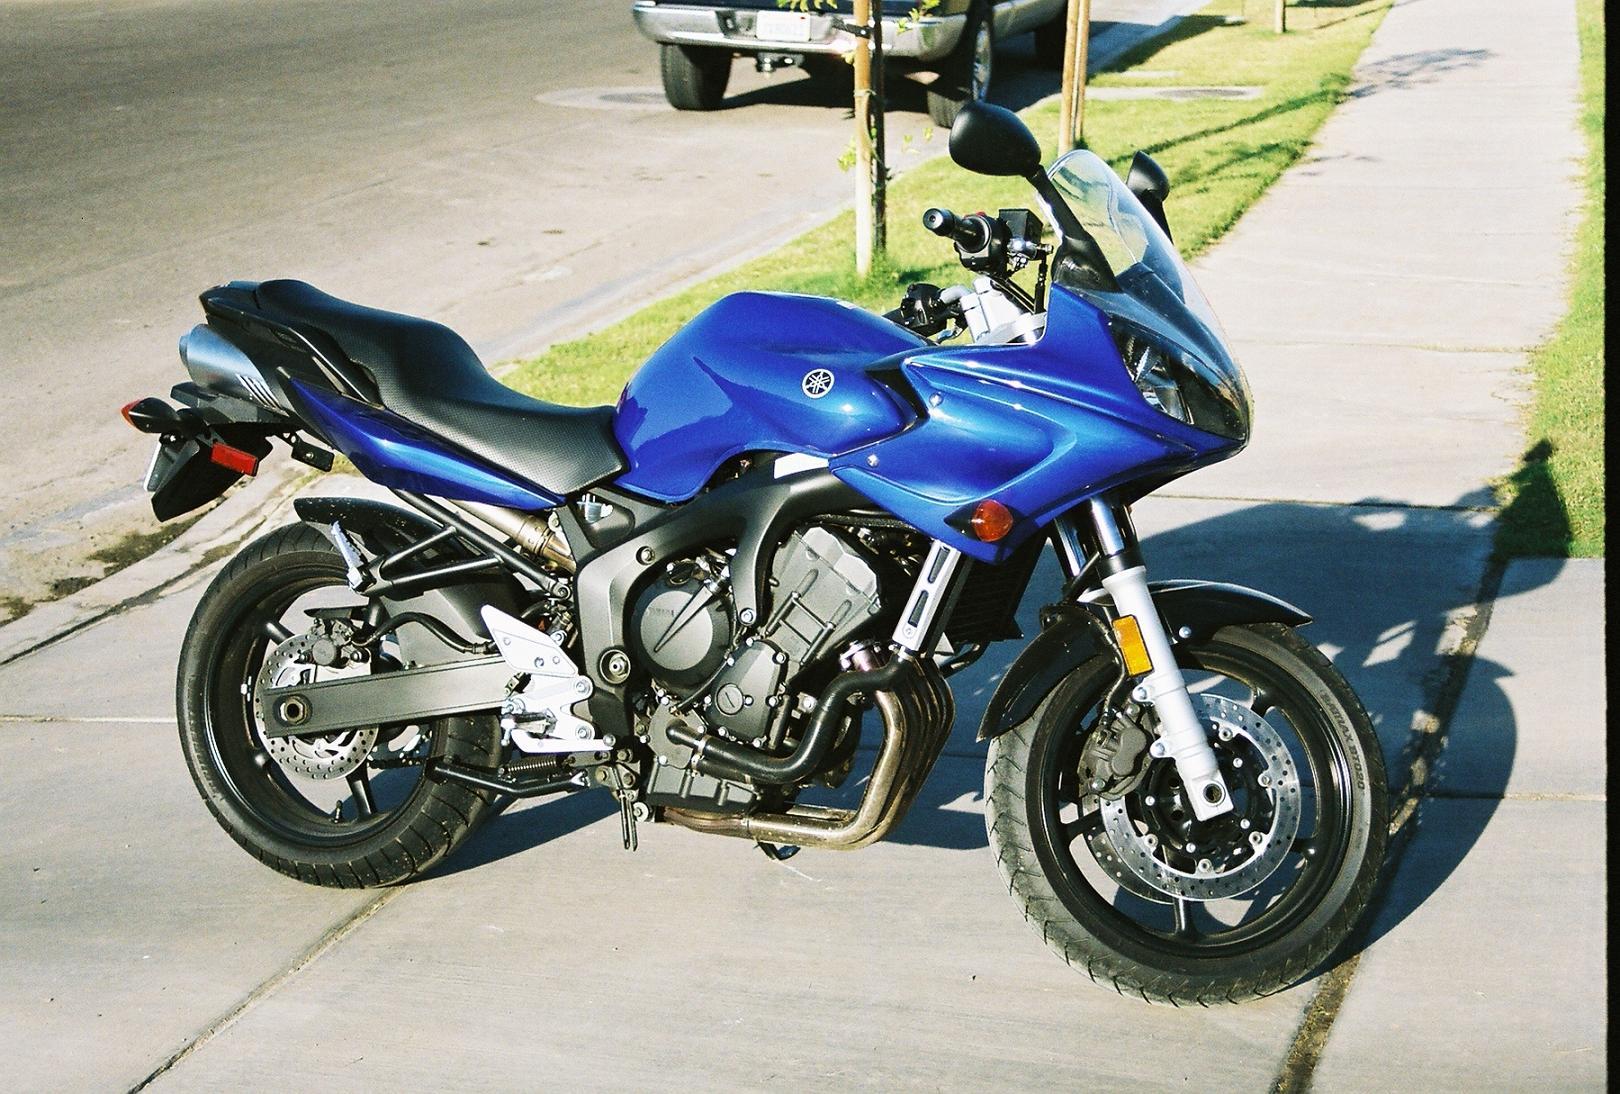 2-- 2006 Yamaha FZ6's For Sale - Sportbikes.net